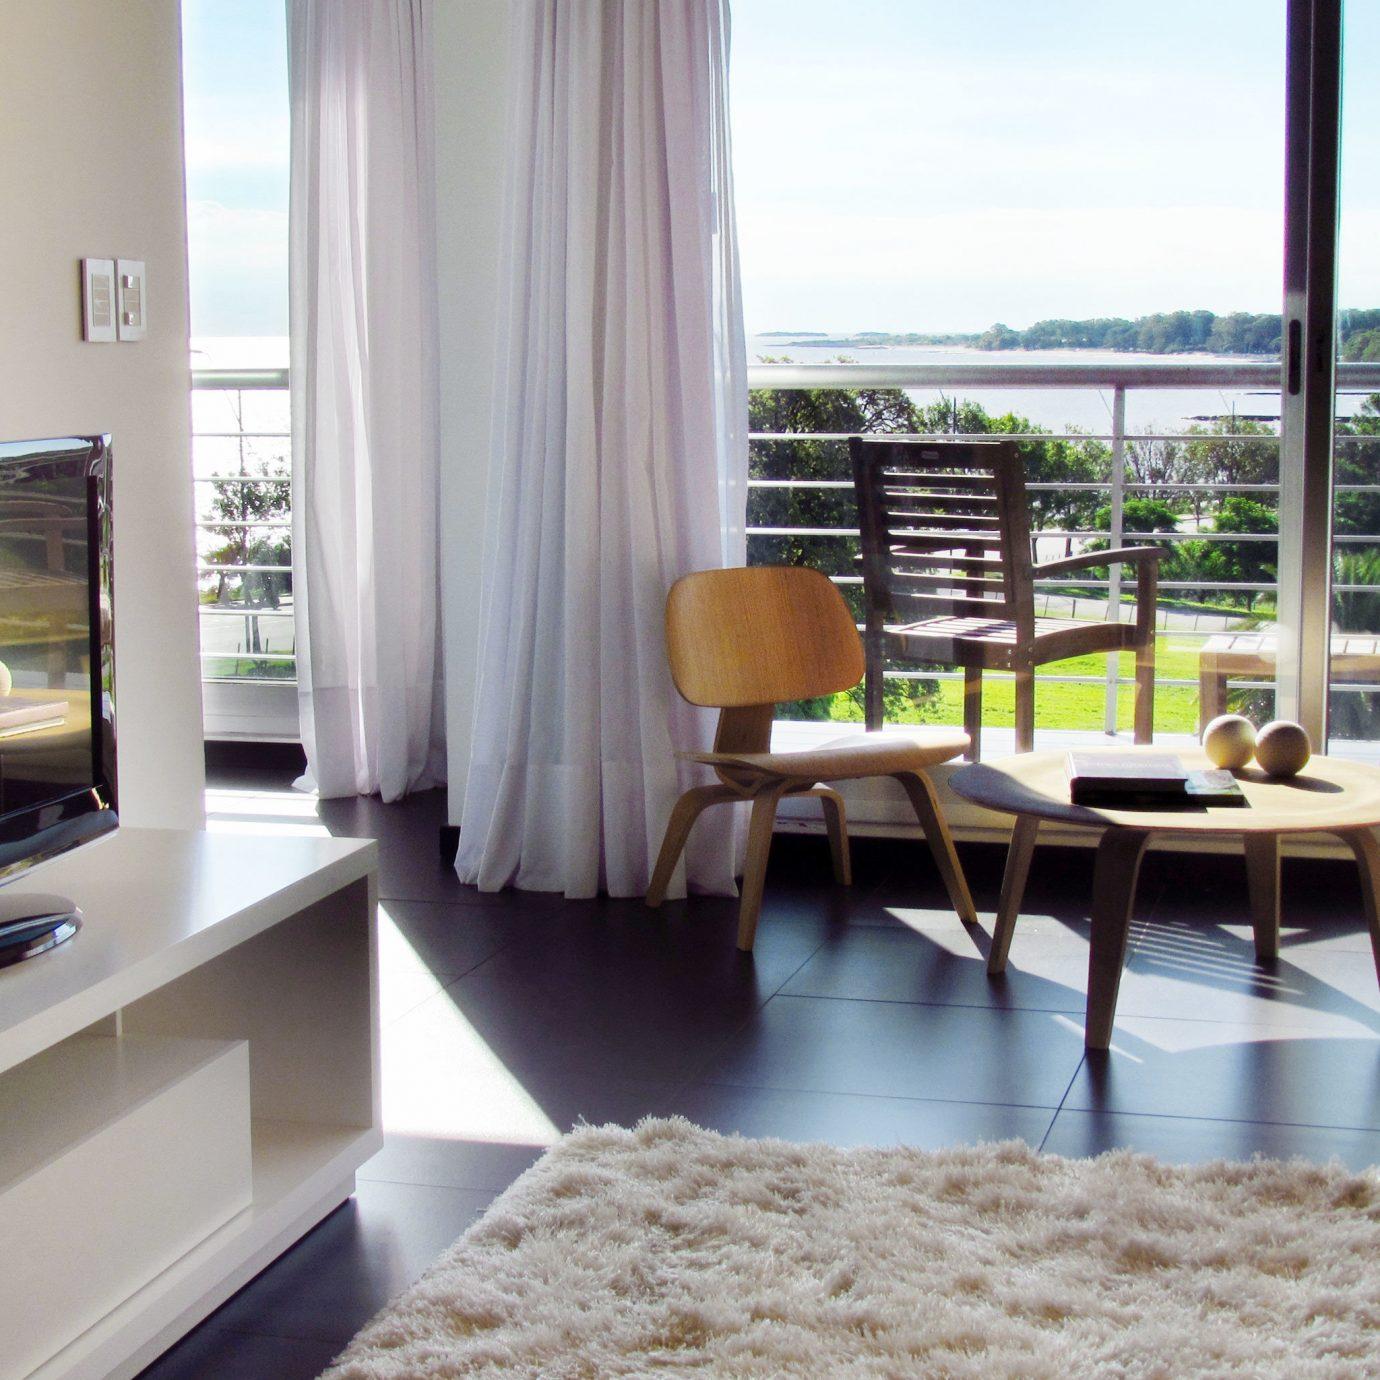 Budget Modern Suite Town property condominium home living room Villa cottage flat